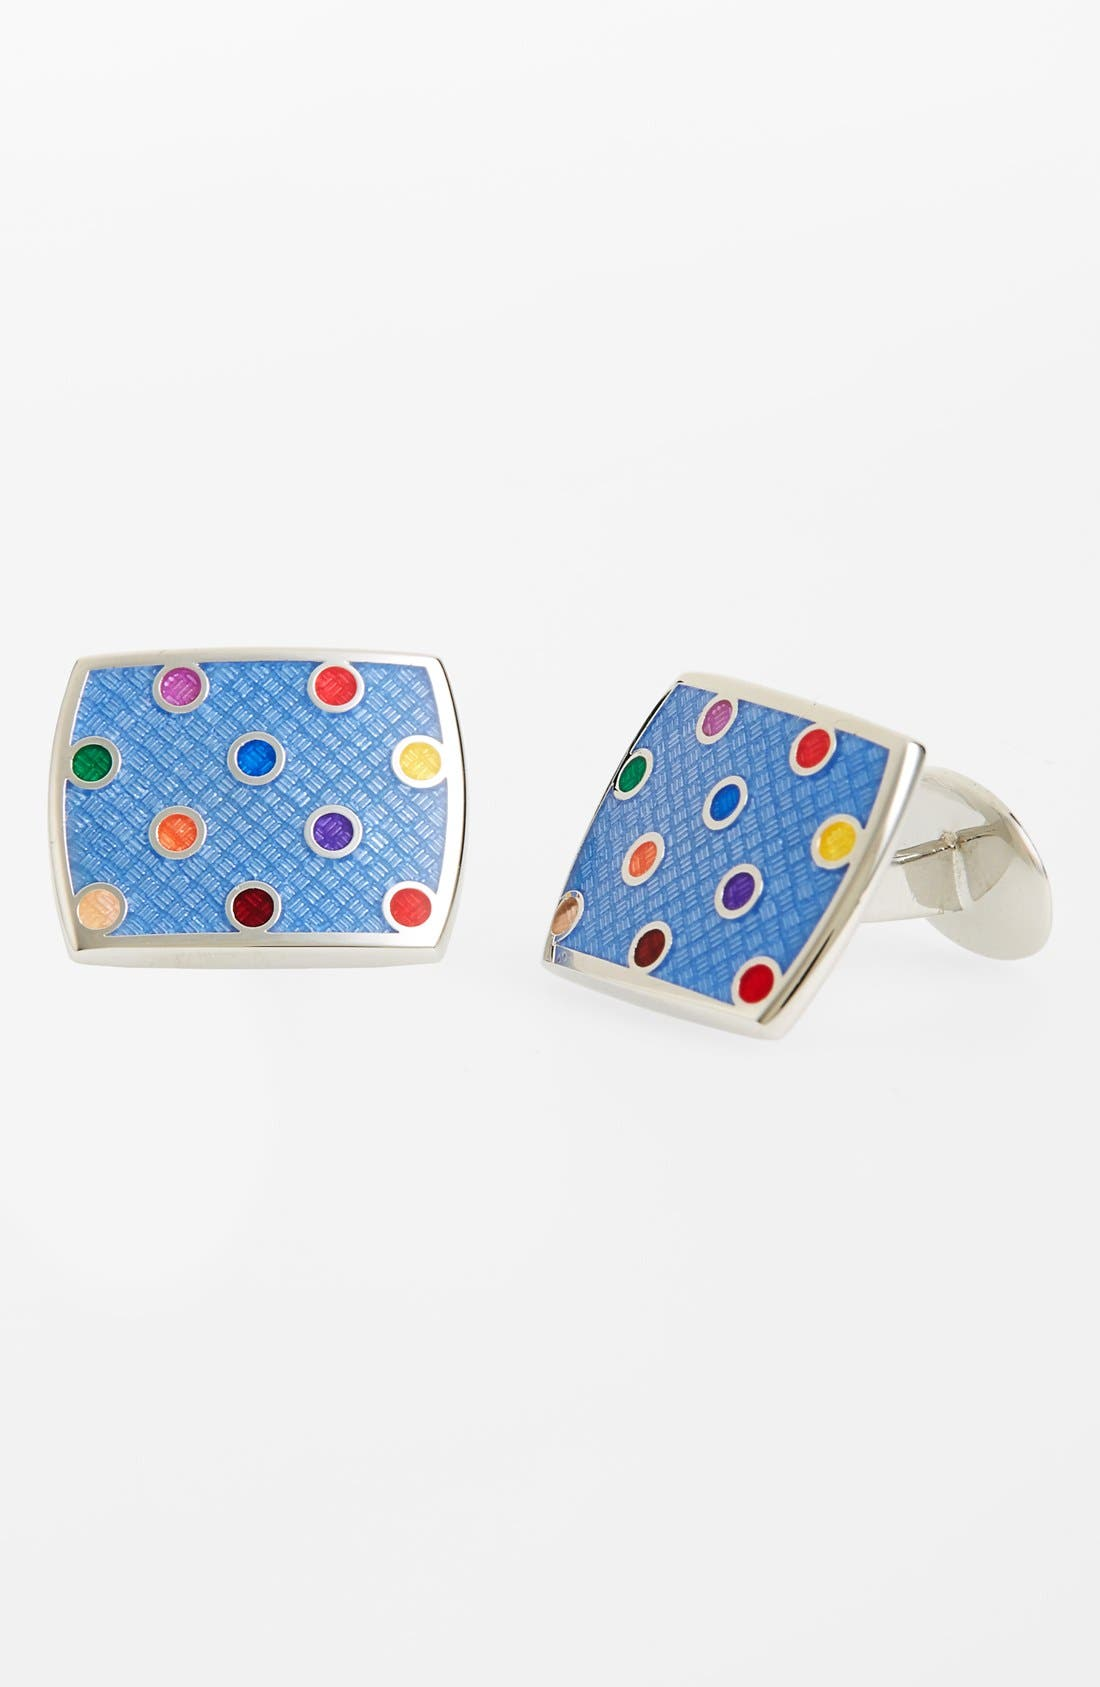 Polka Dot Cuff Links,                             Main thumbnail 1, color,                             Silver/ Blue/ Multi